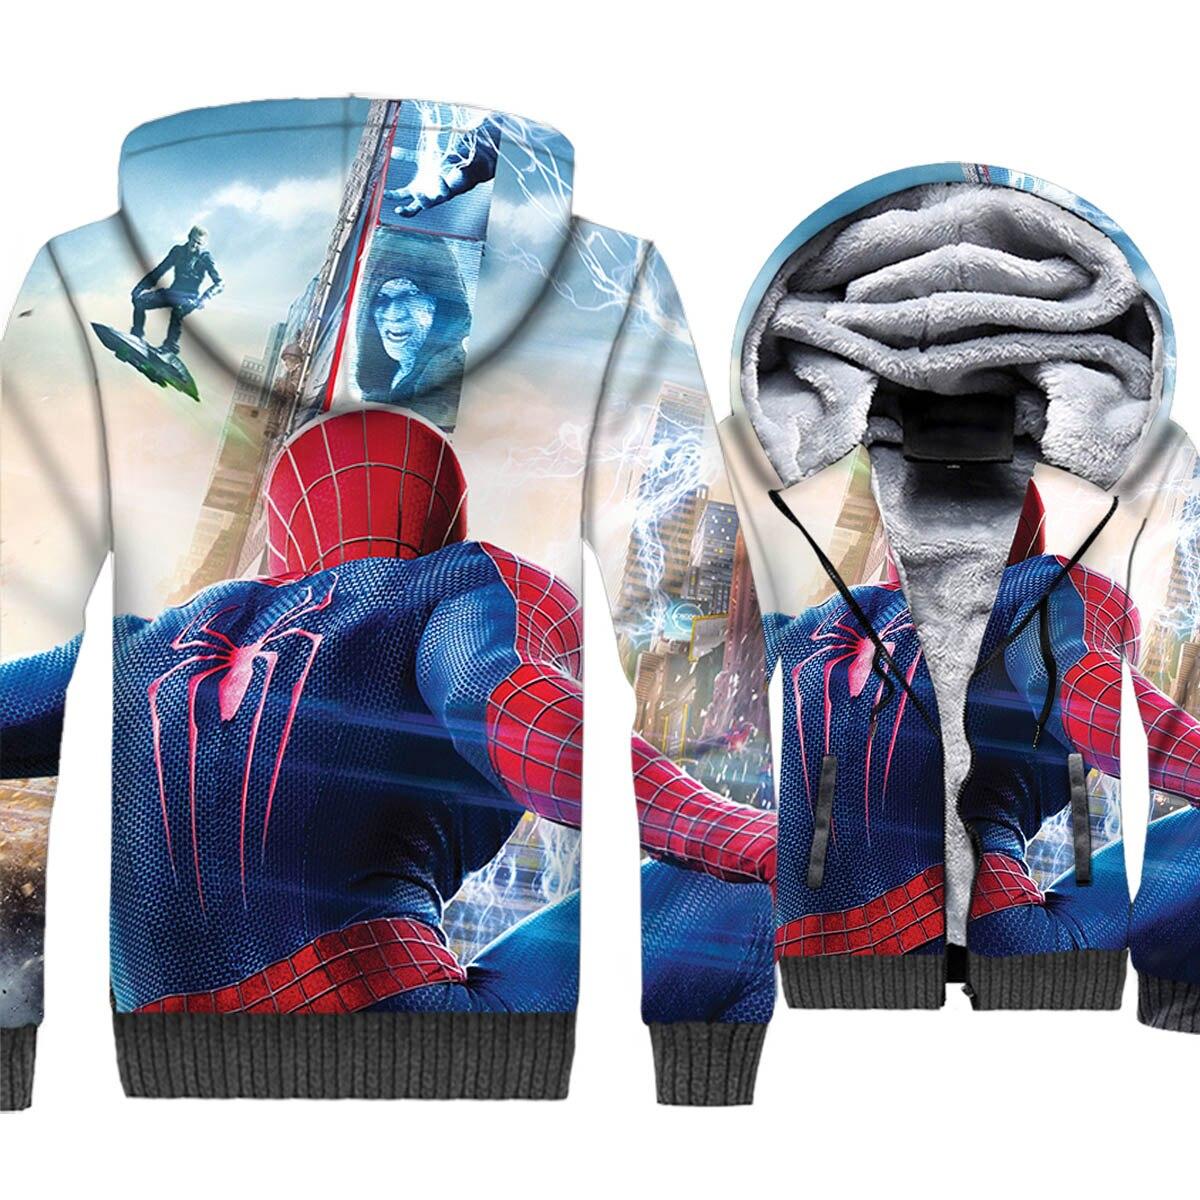 Spider Man Jacket Men Super Hero Hoodie Crossfit Hooded Sweatshirt Mens New Winter Thick Fleece Warm 3D Print Coat Plus Size 5XL